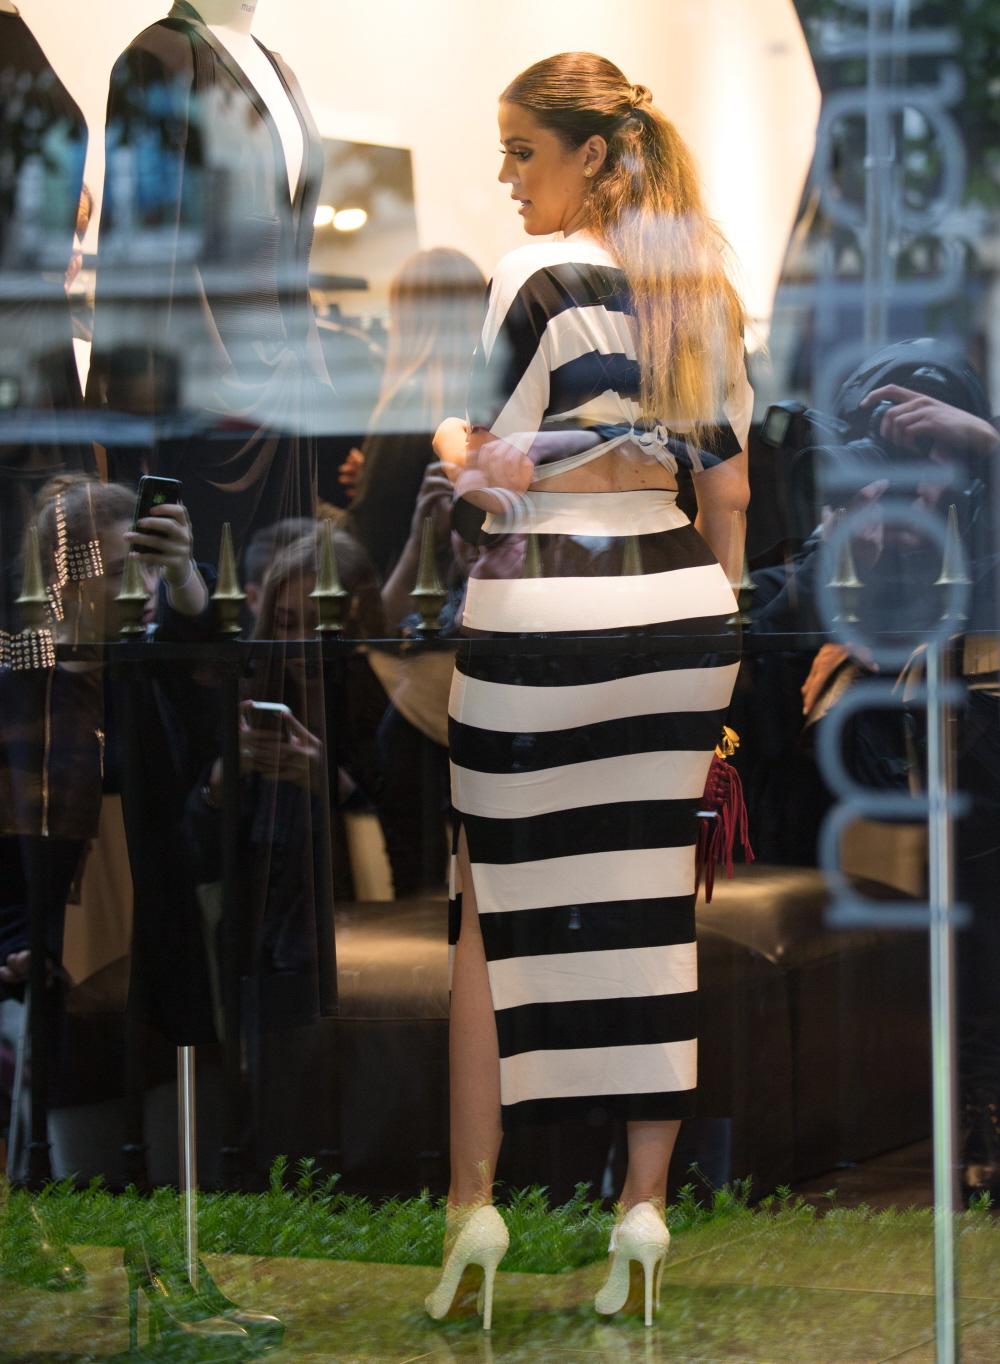 FFN_Kardashians_Shopping_CHP_052114_51424962.jpg